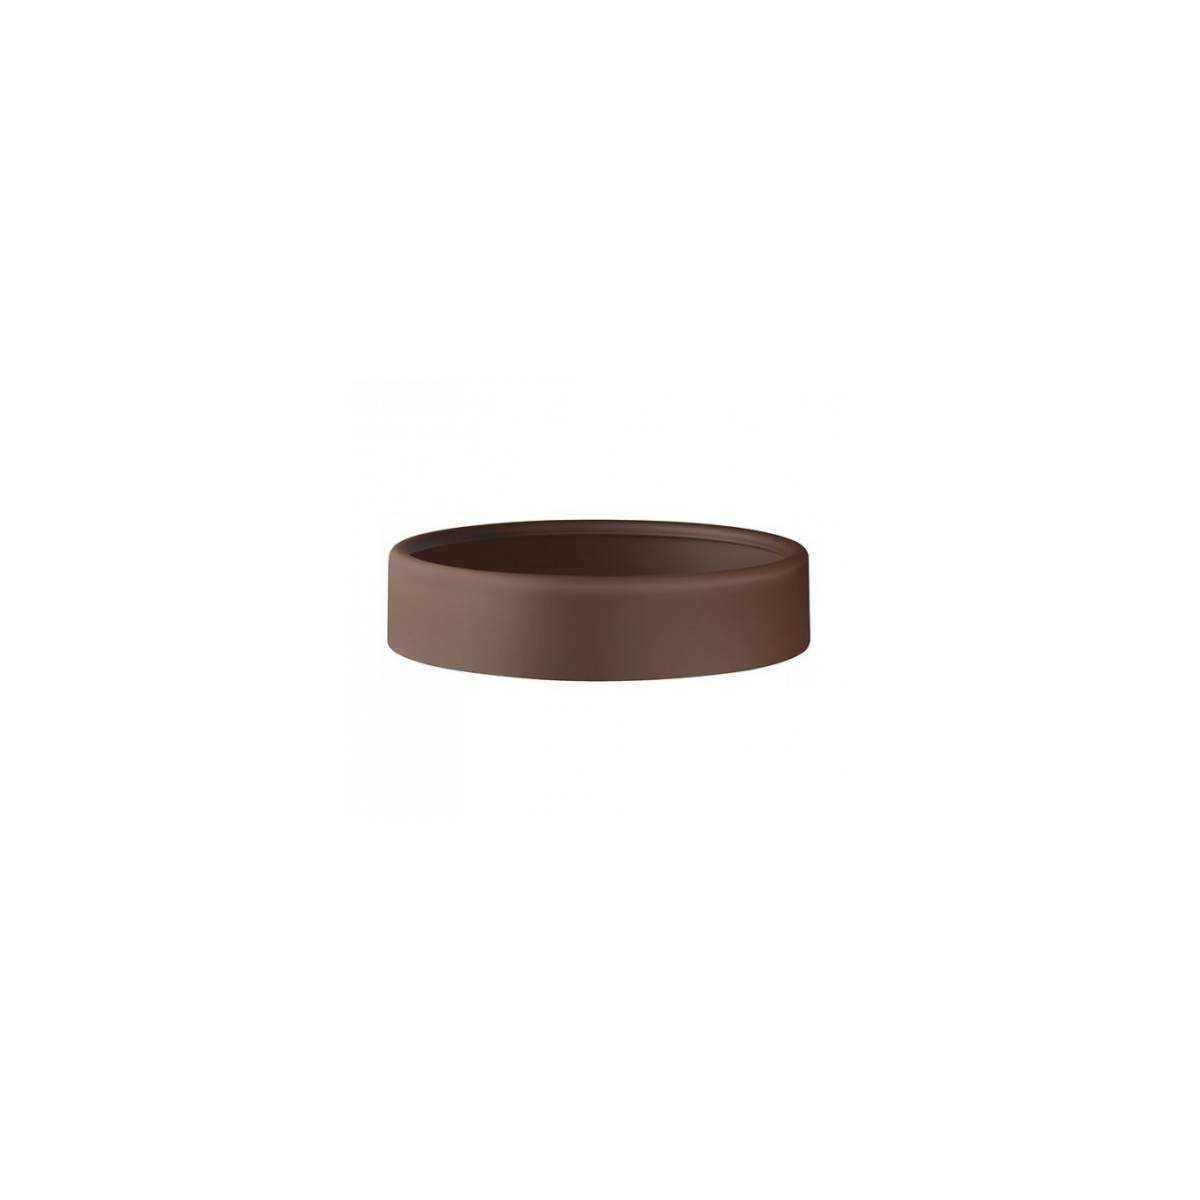 Кольцо-держатель для урны арт.A52601MA COLORED (A54401MA) A54401MA Mar Plast